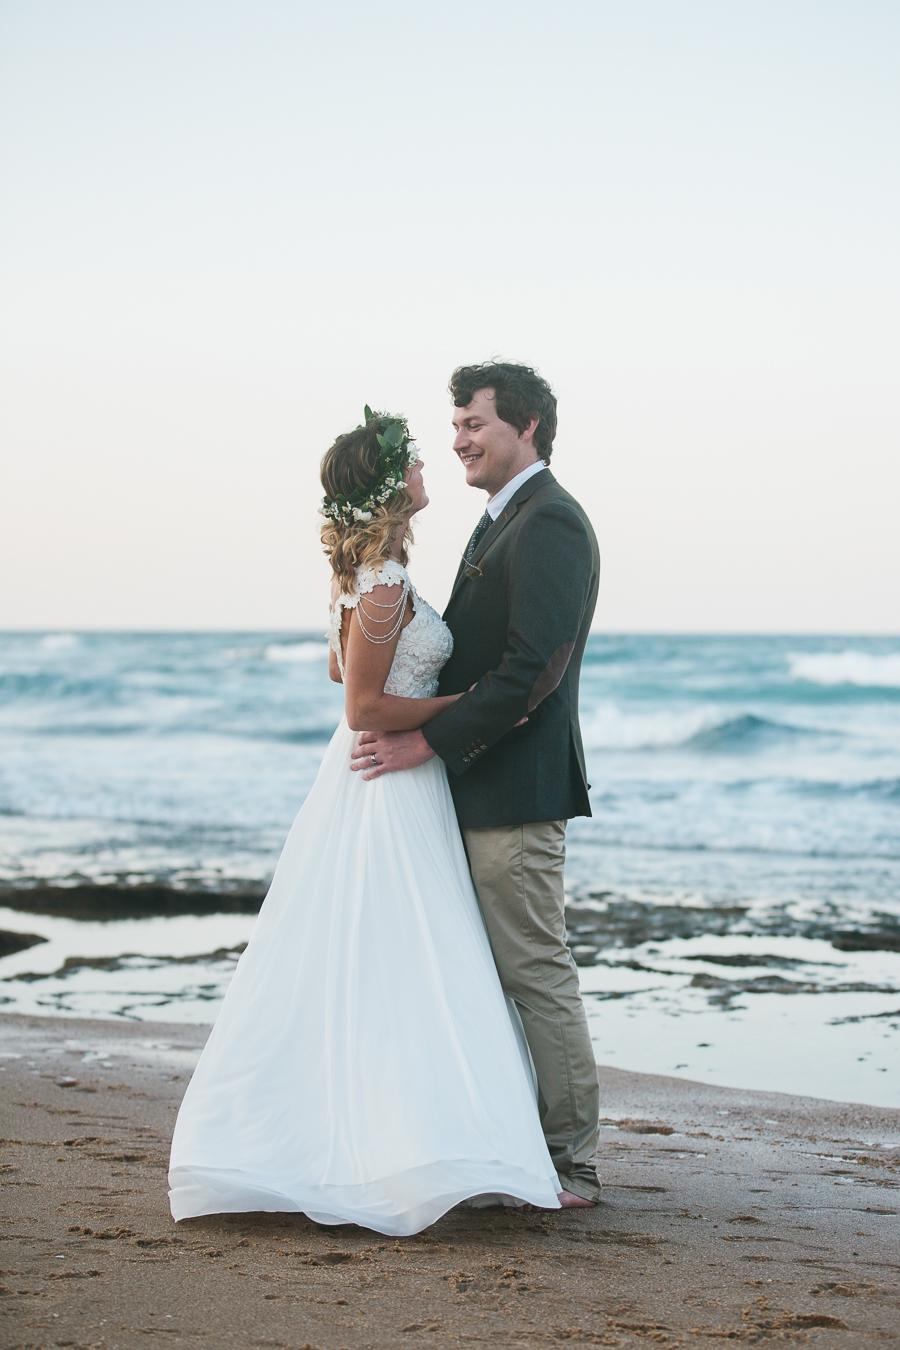 Nadia&Johan_Beachwedding_TanyaStraussphotography-135